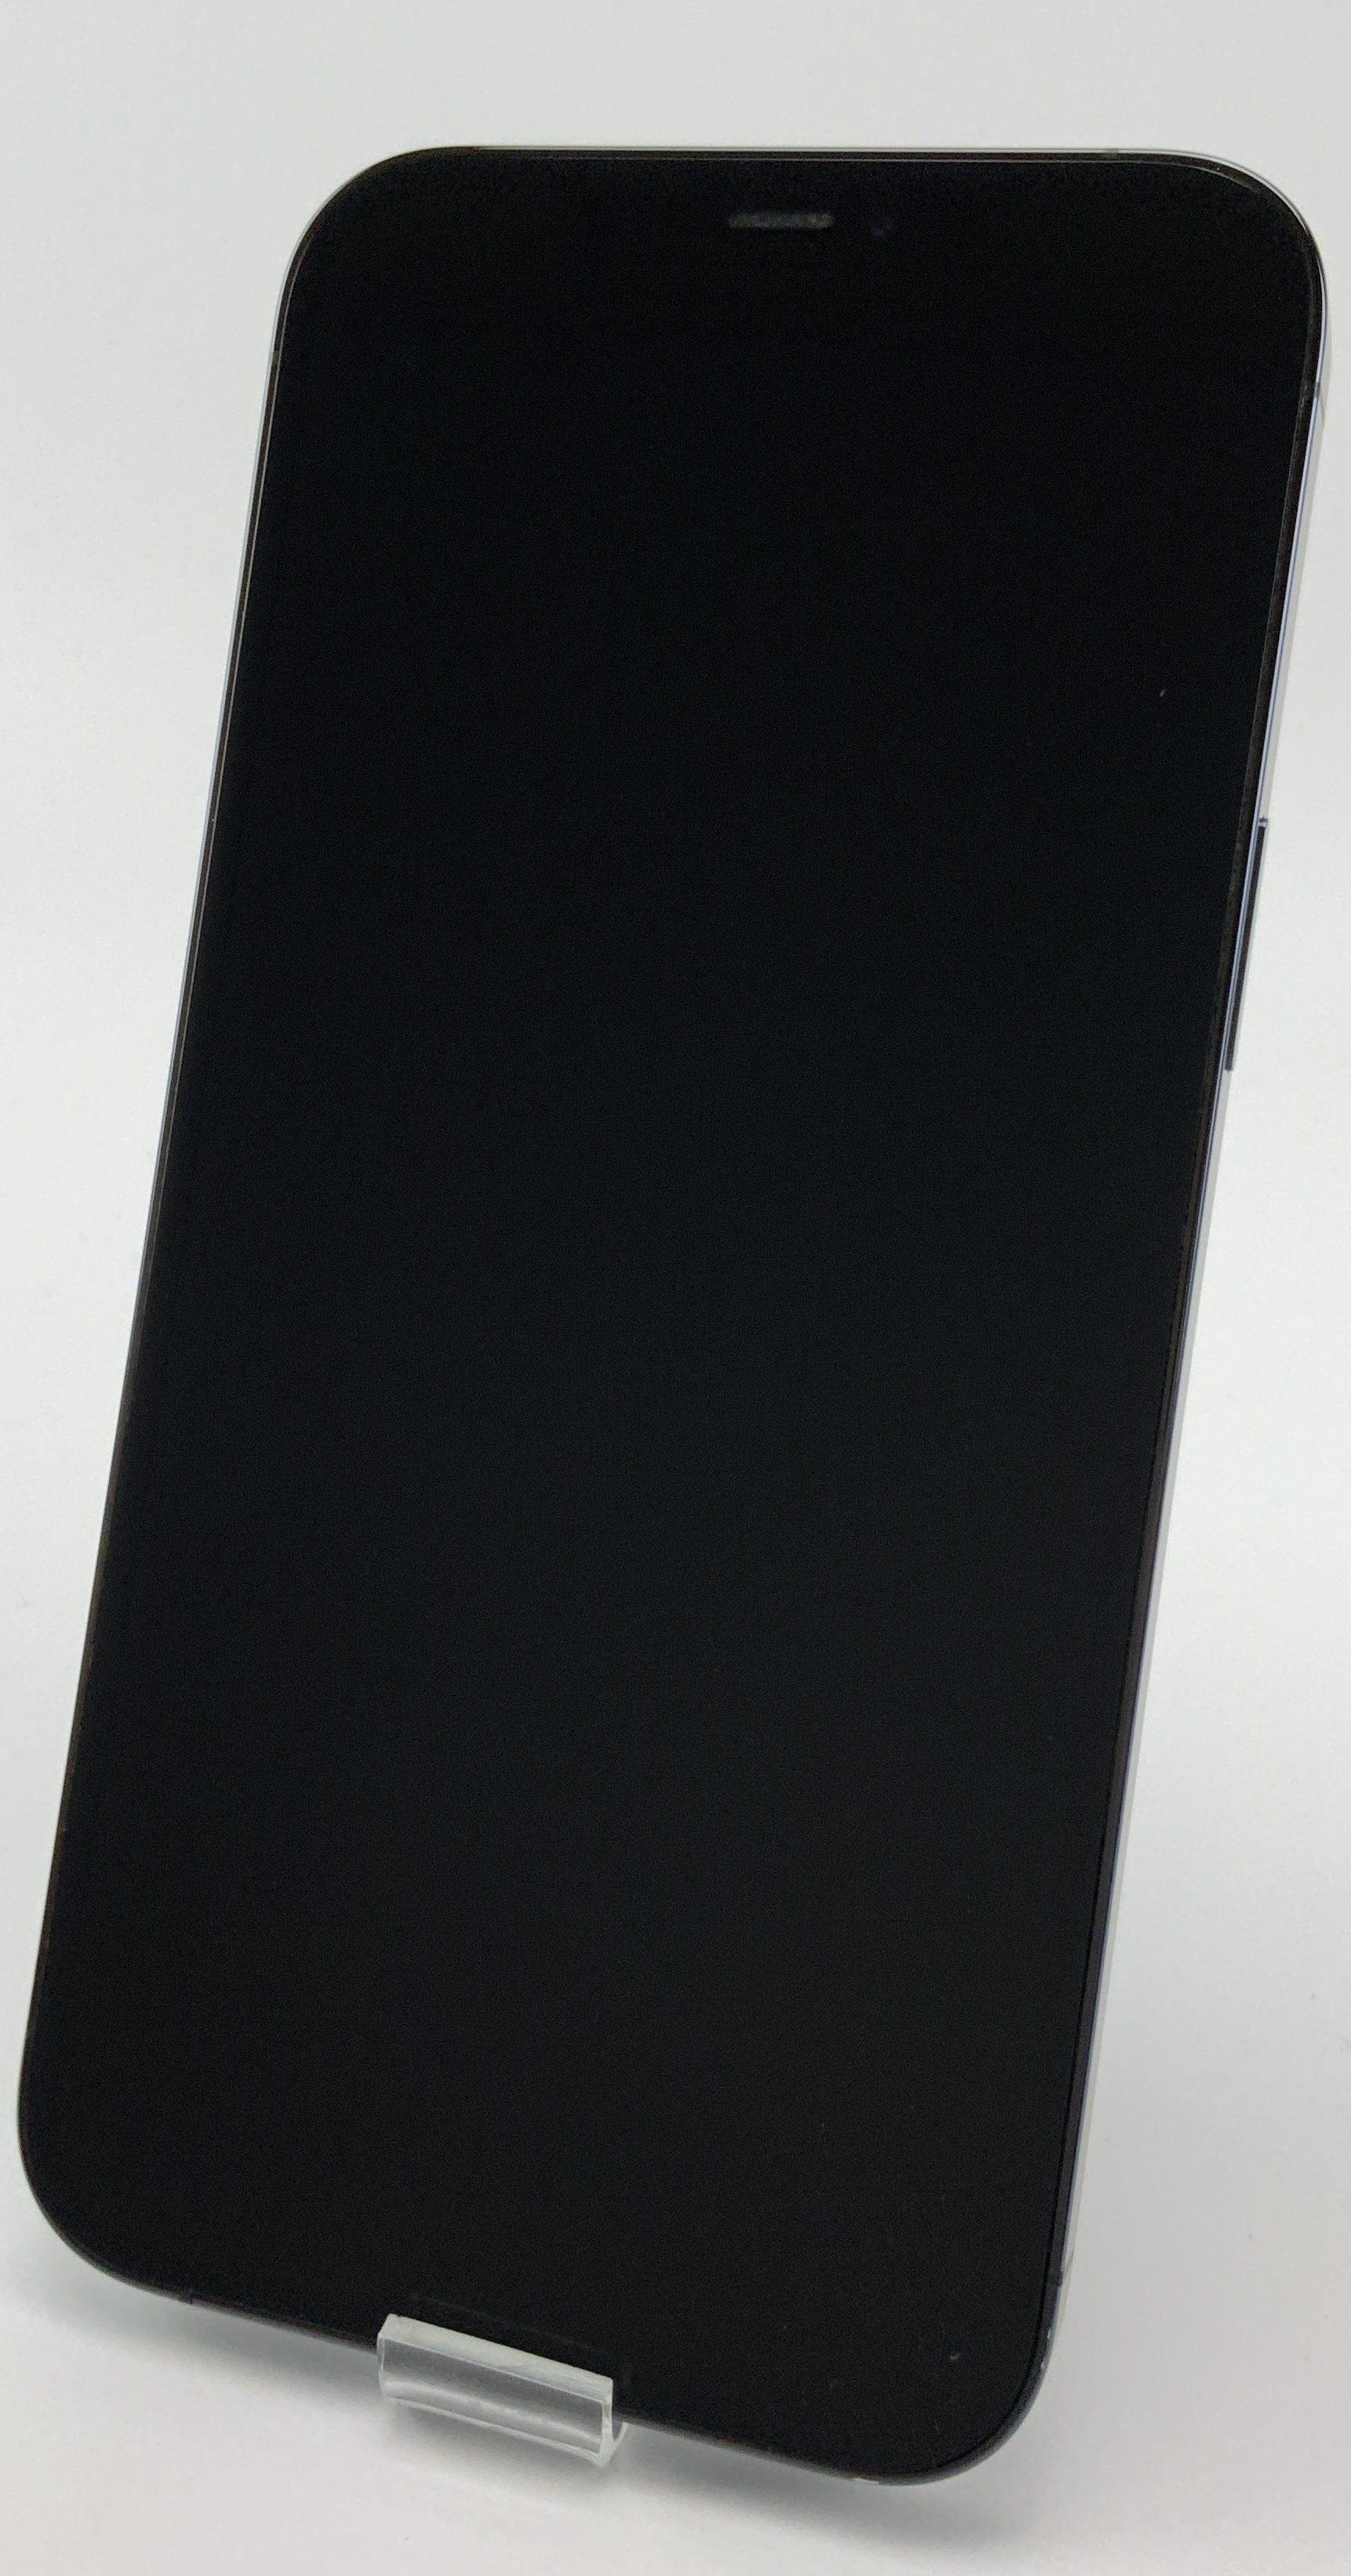 iPhone 12 Pro Max 512GB, 512GB, Pacific Blue, obraz 1